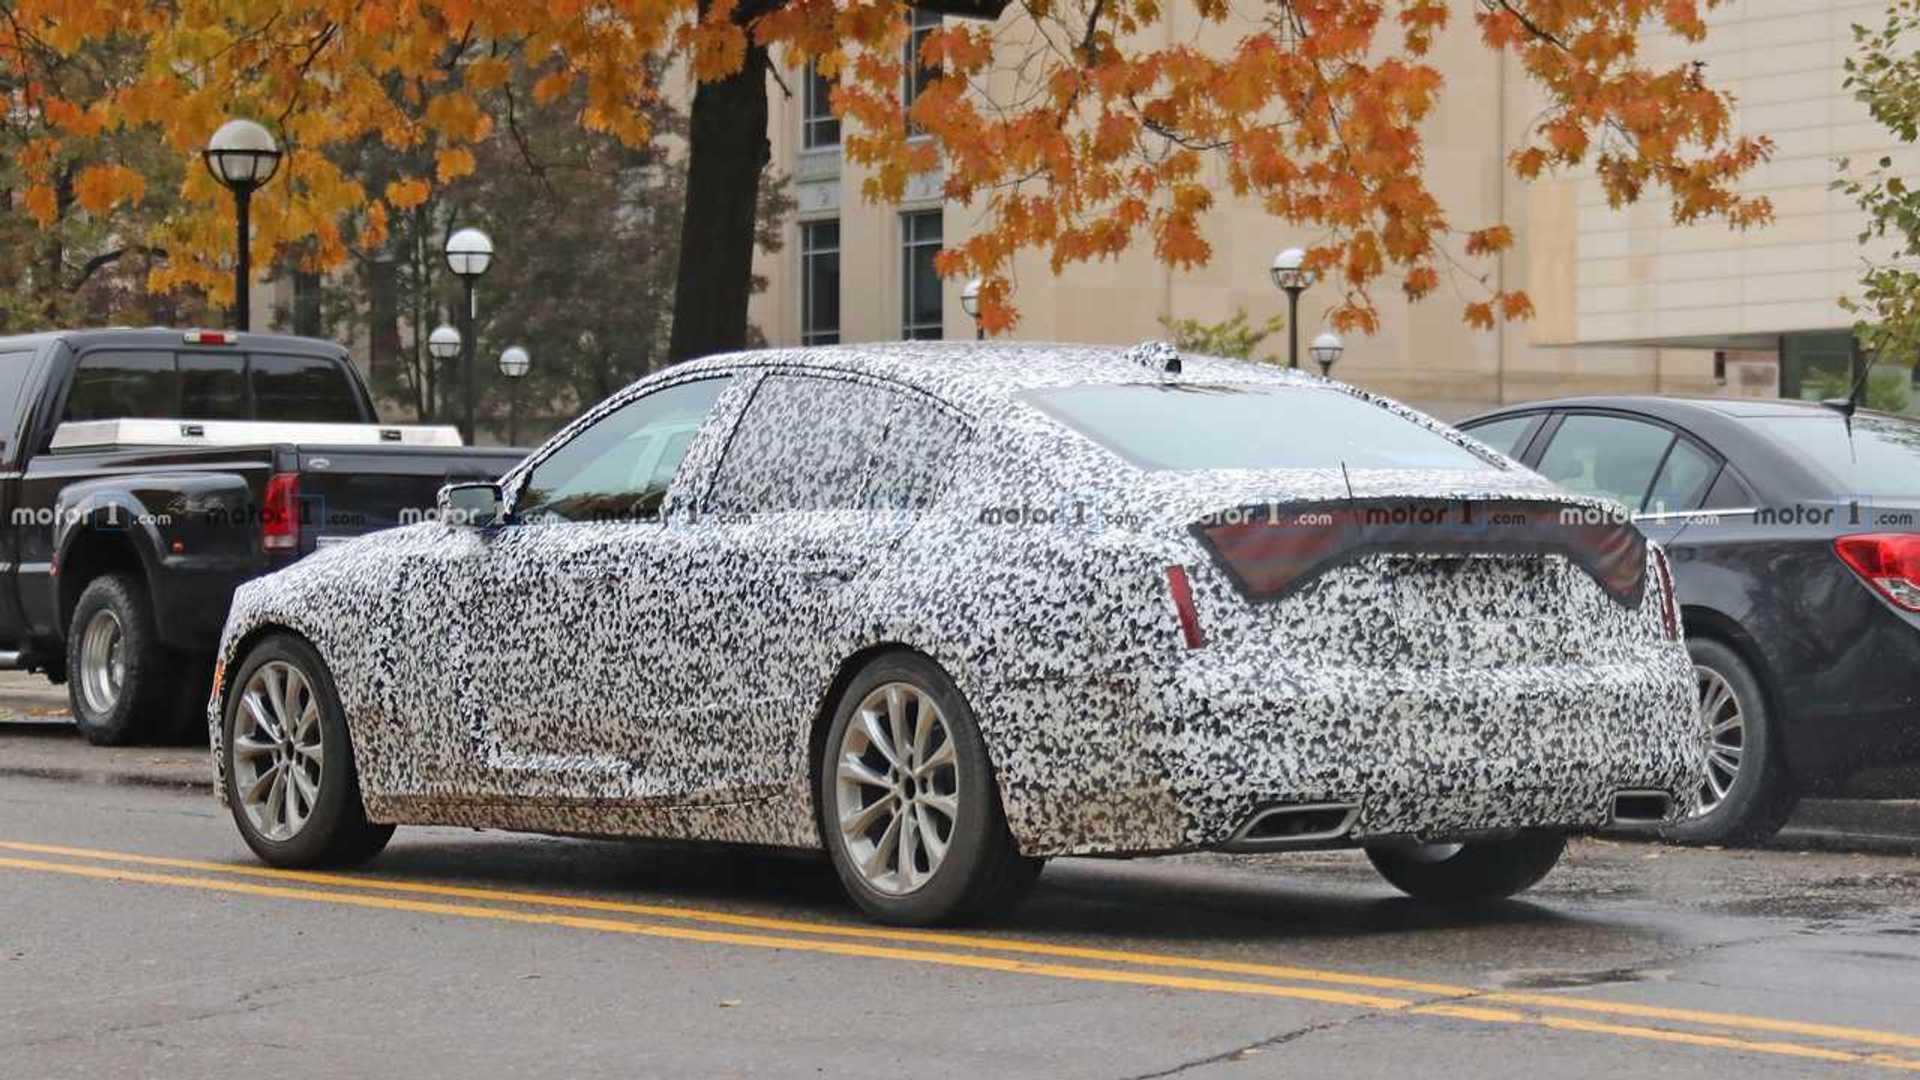 2020 Cadillac Ct5 Interior Release Date Price Redesign 2019